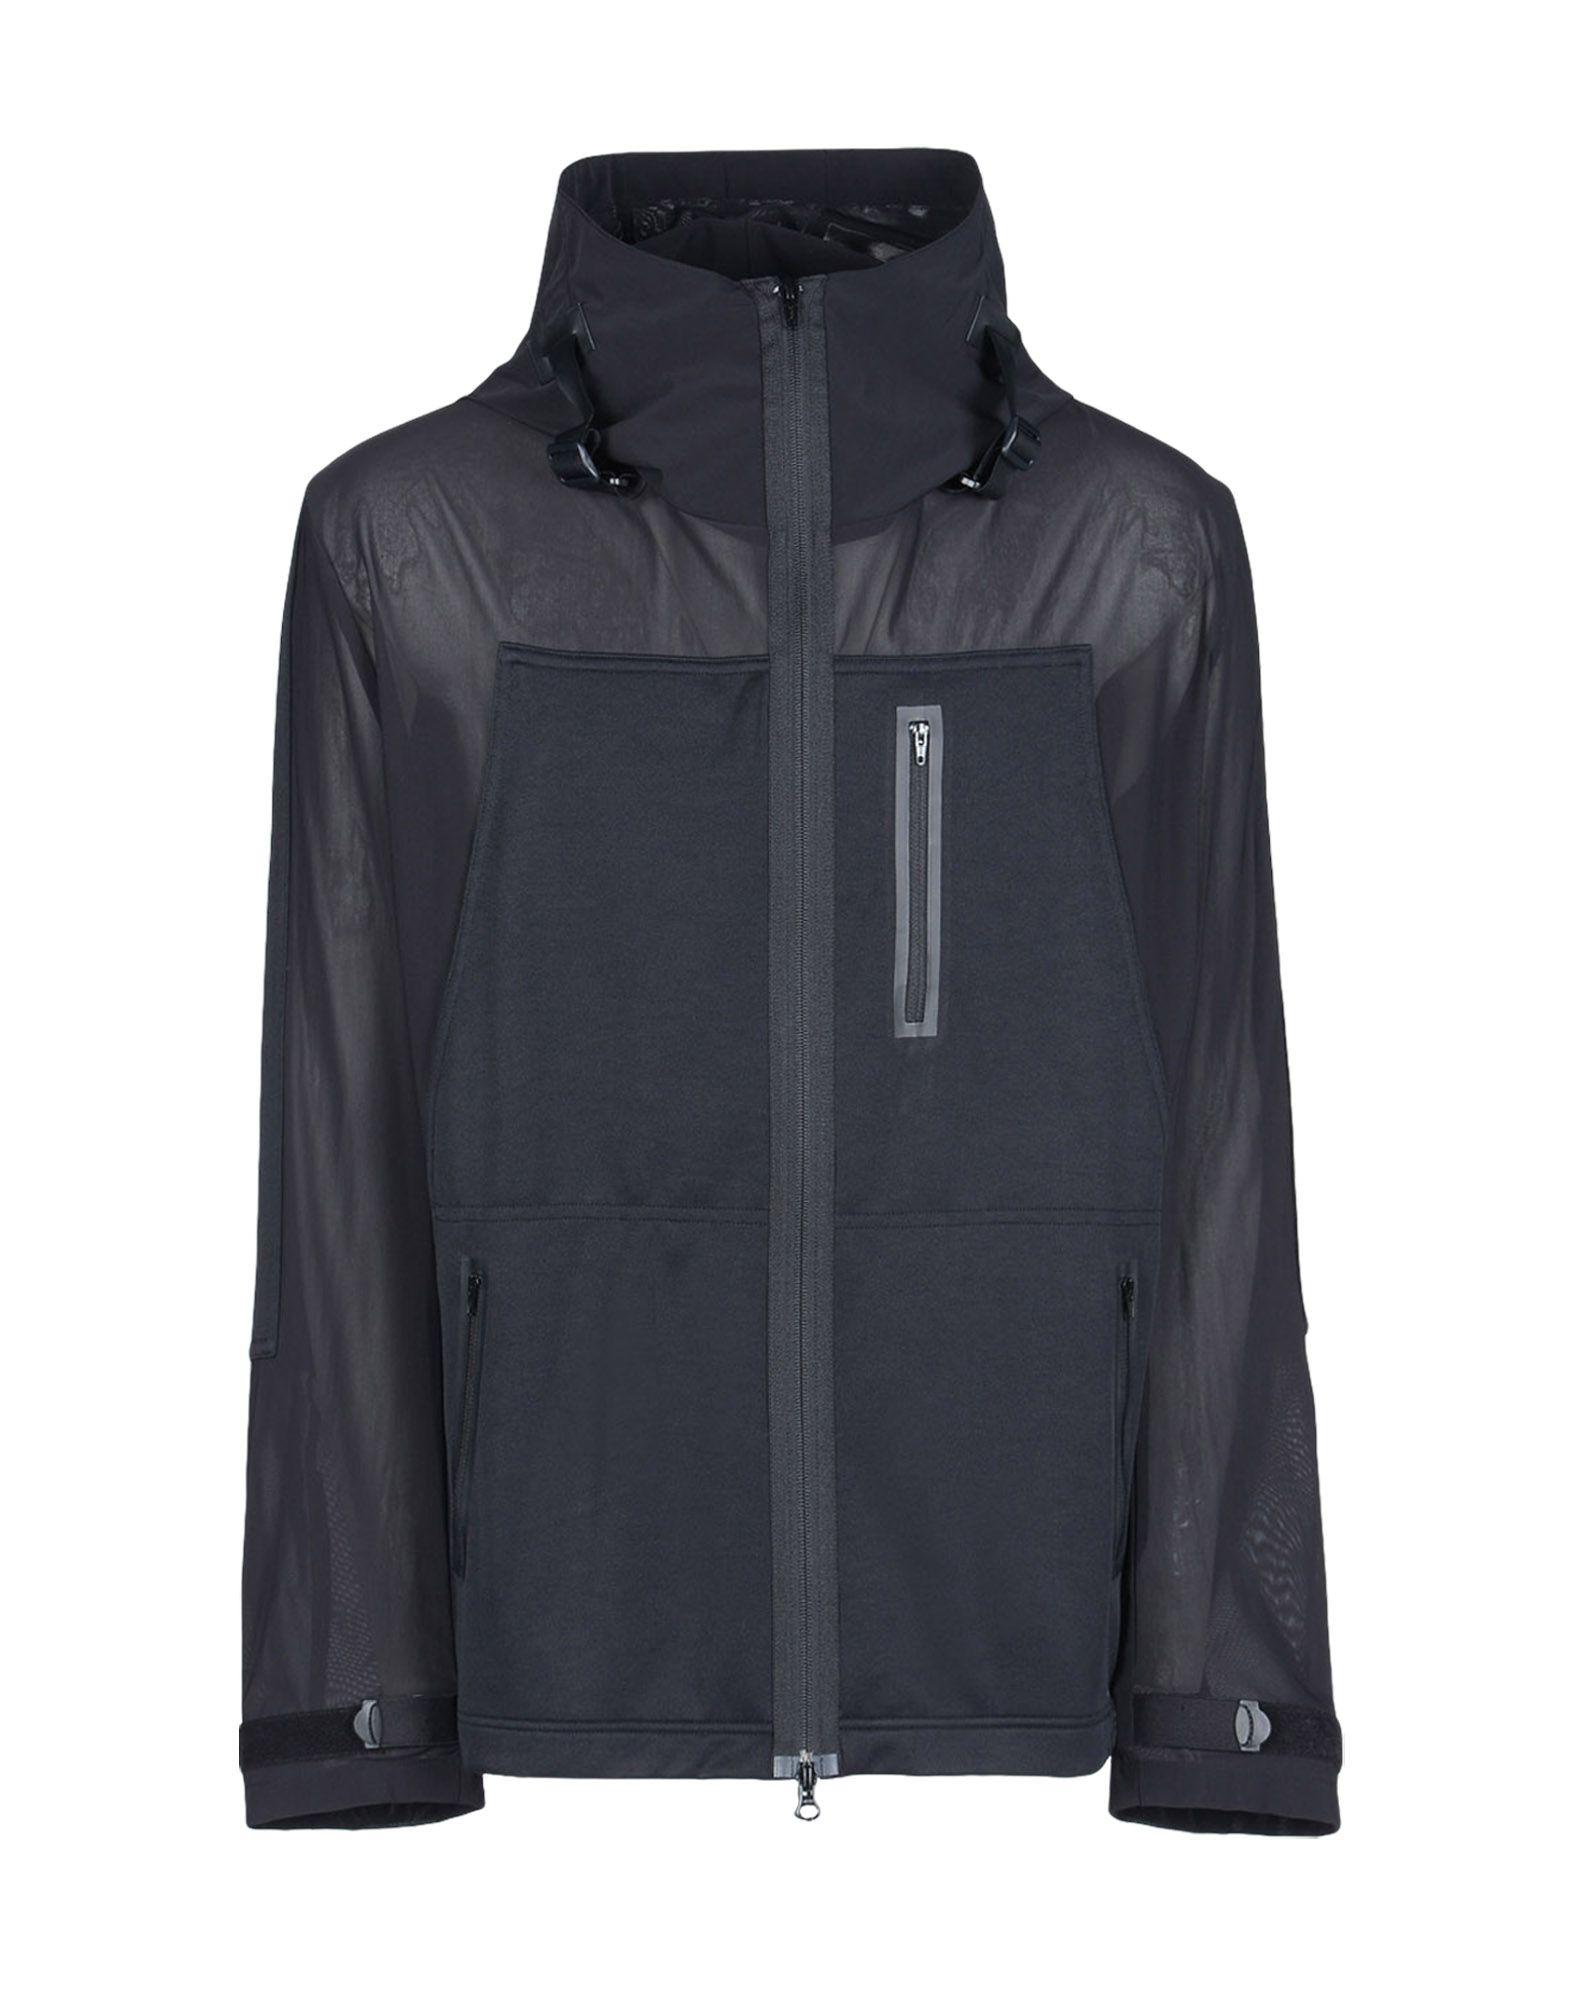 Adidas jacket - Y 3 Future Mesh Bomber Coats Jackets Man Y 3 Adidas